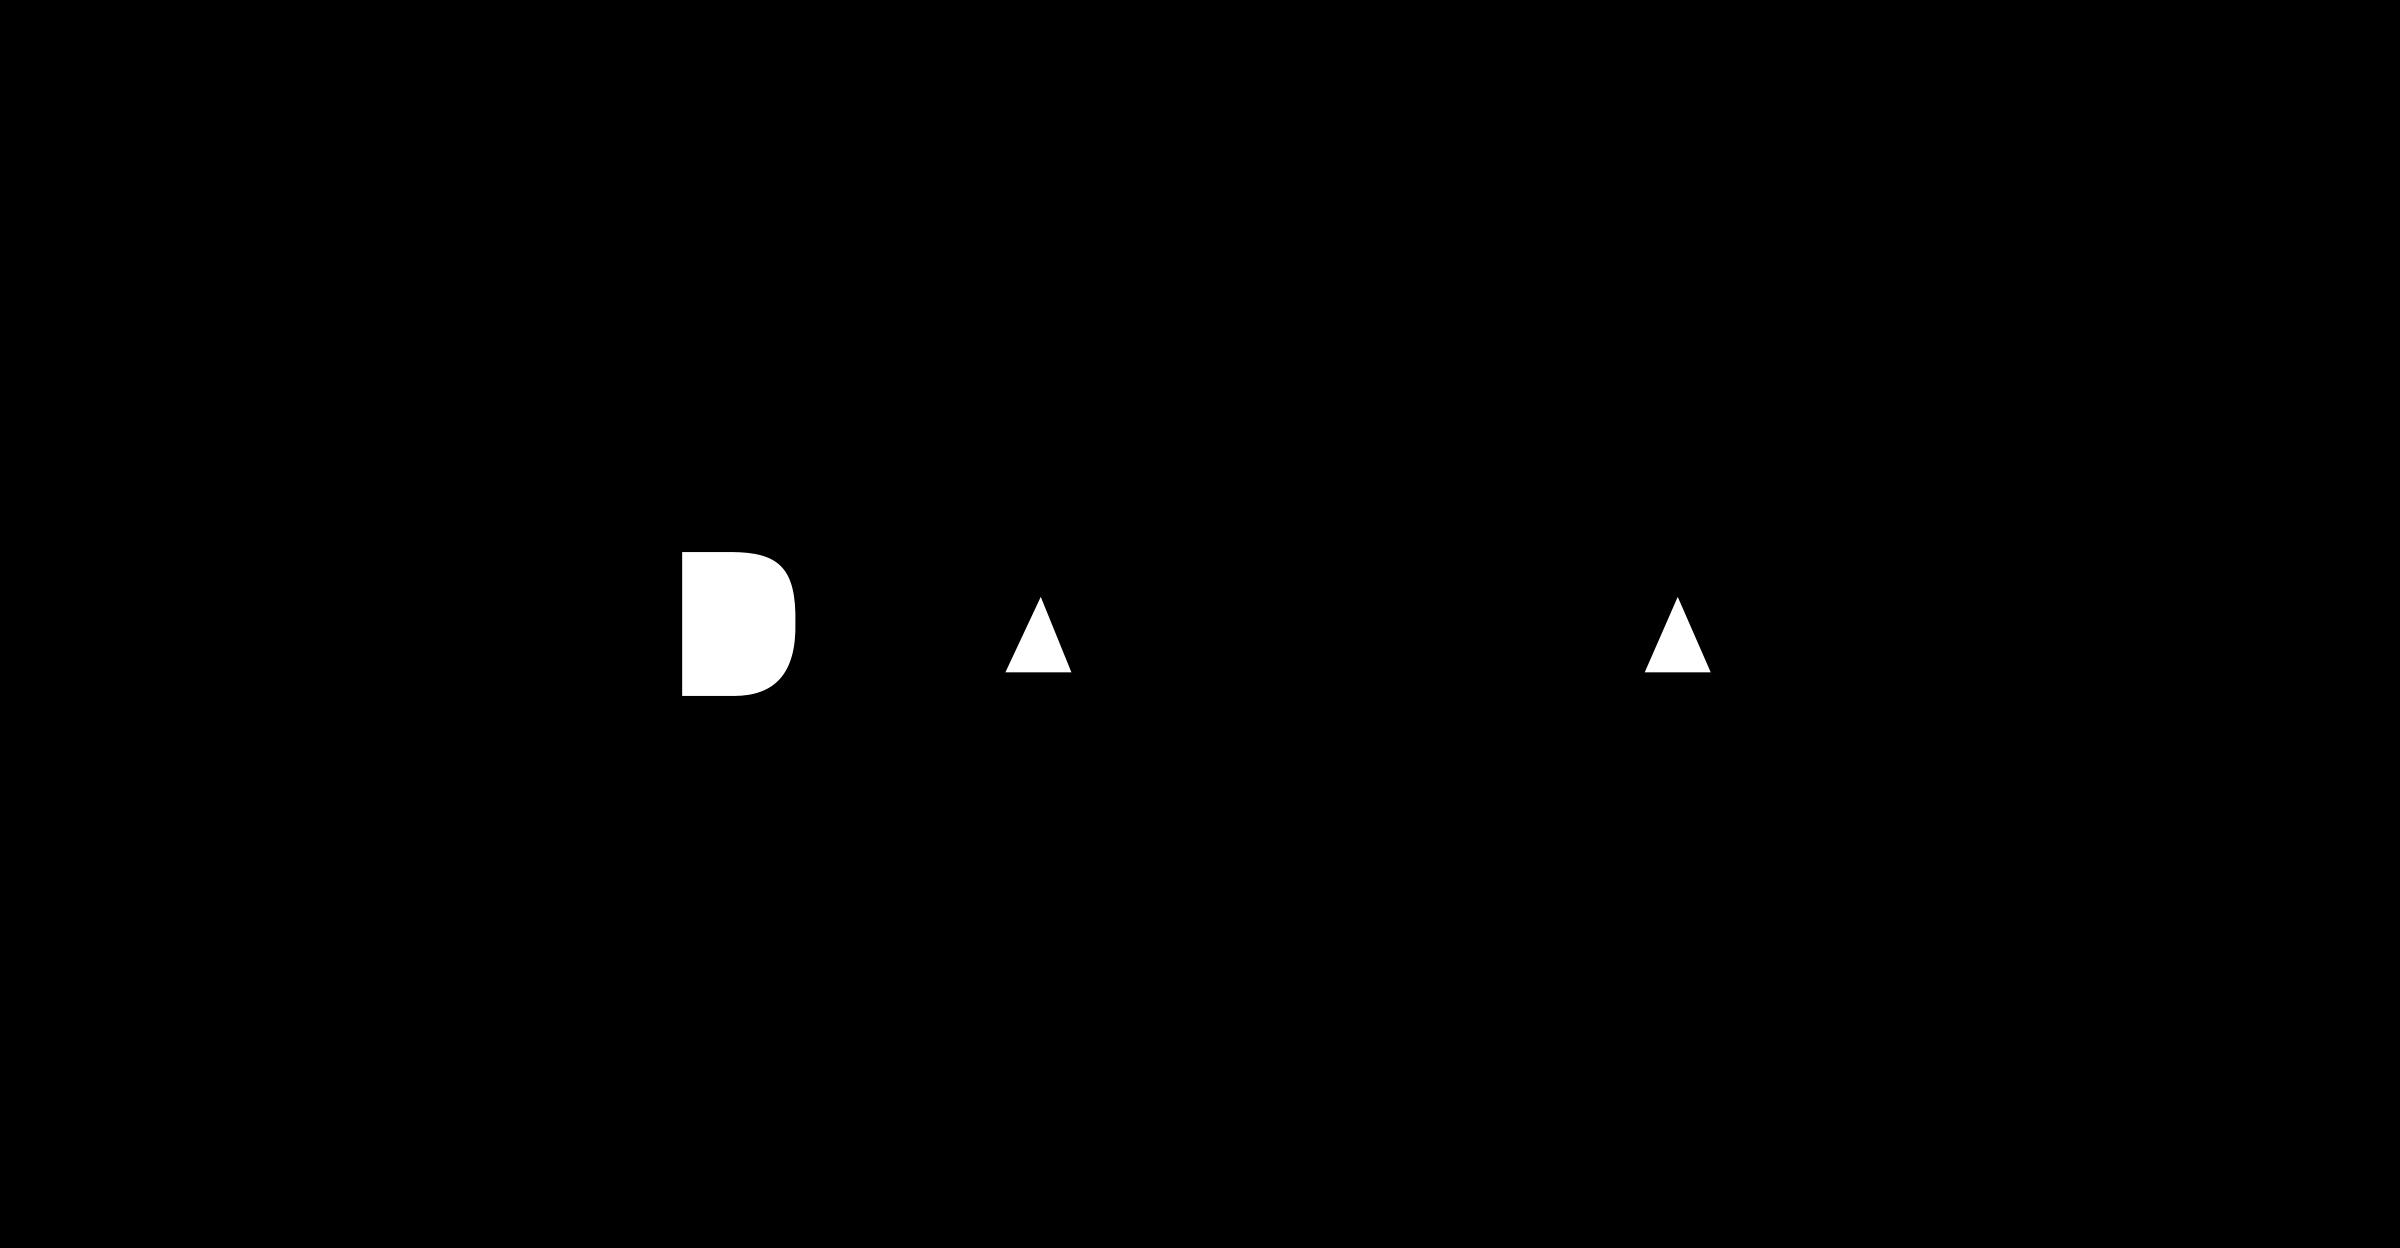 dana logo png transparent svg vector freebie supply dana logo png transparent svg vector